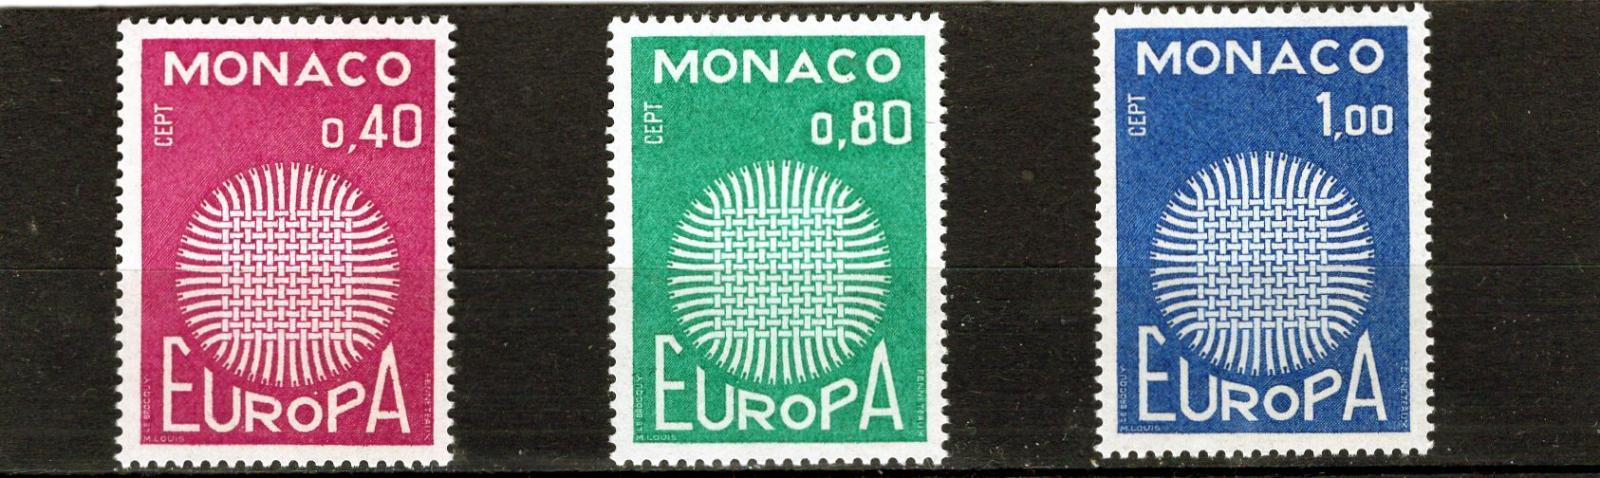 EUROPA CEPT - Monako Mi 977-9** - Filatelie